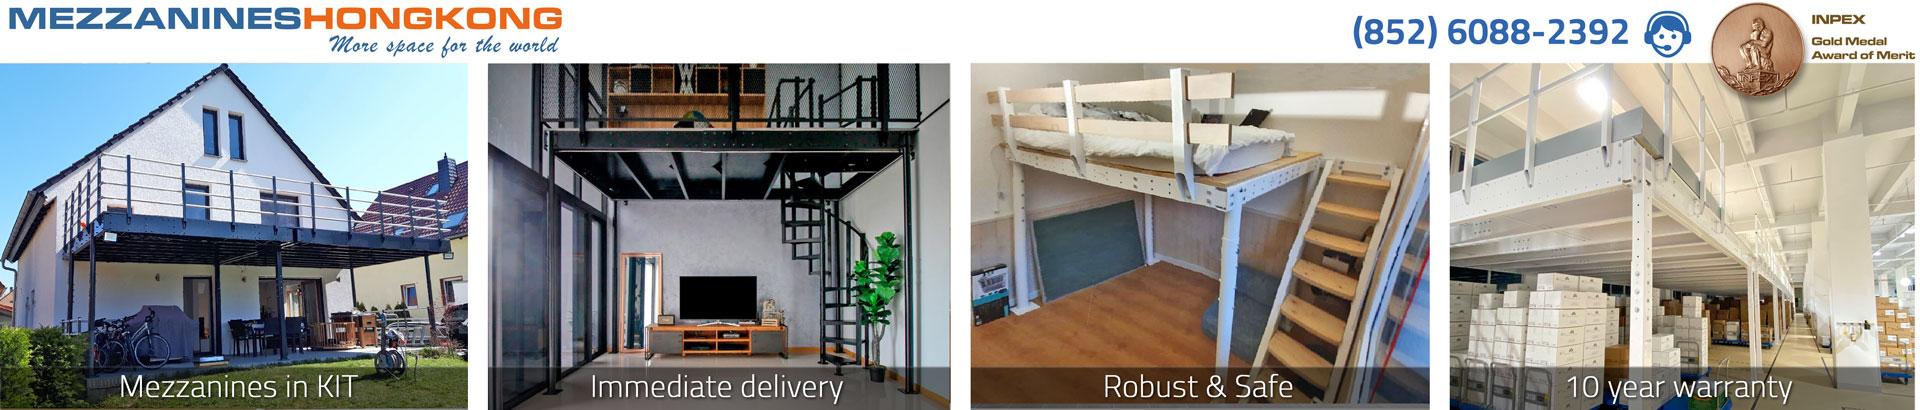 Mezzanines kit - MezzaninesHongKong.com